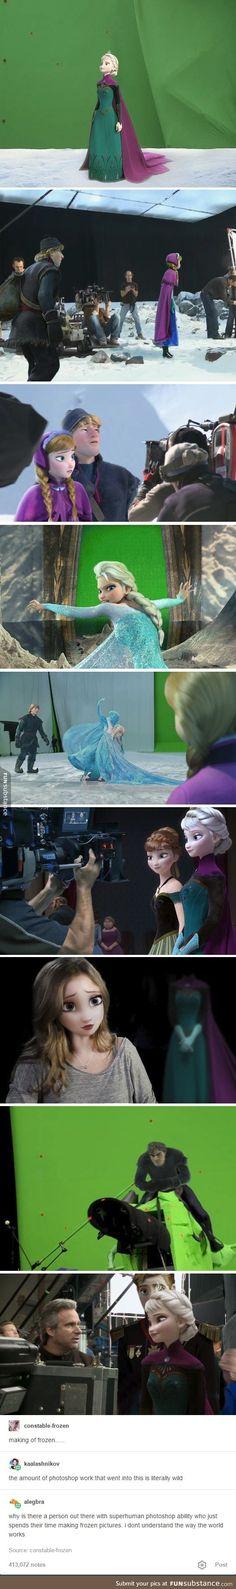 Disney funny - Behind the scenes of Frozen Disney Pixar, Animation Disney, Film Disney, Disney Facts, Disney Marvel, Disney And Dreamworks, Disney Magic, Disney Frozen, Disney Movies